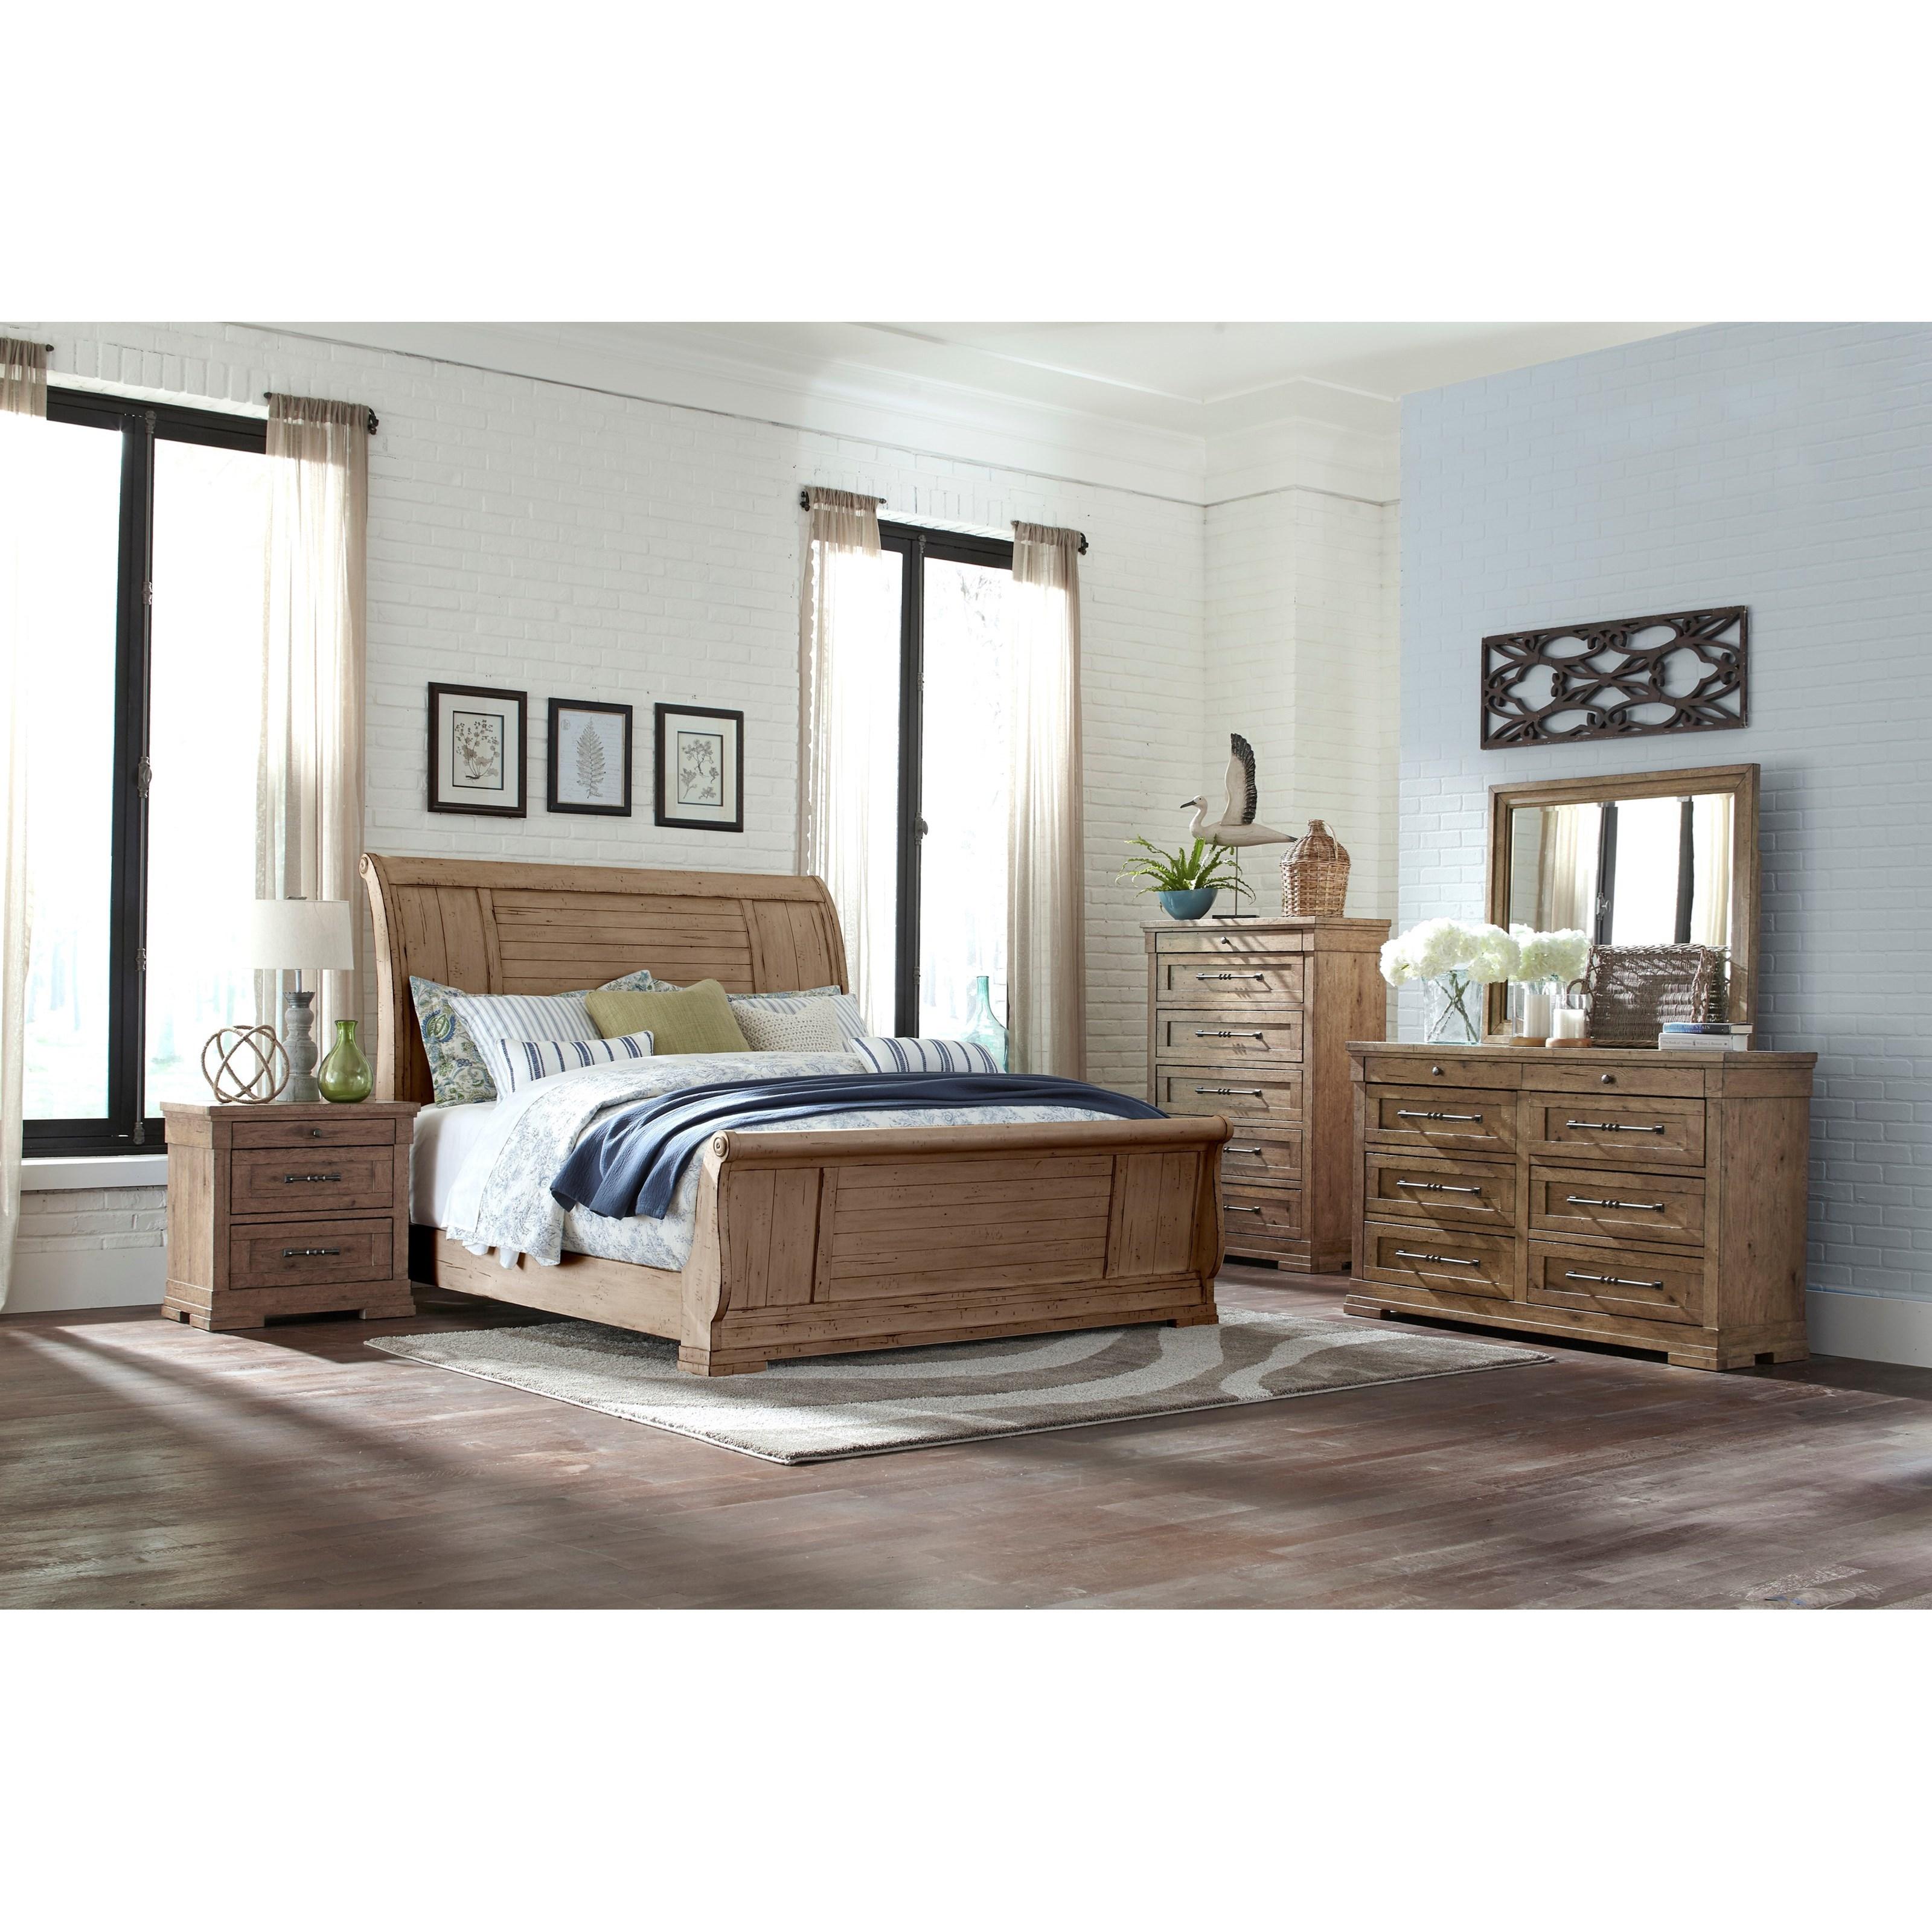 Trisha Yearwood Home Coming Home King Bedroom Group Belfort Furniture Bedroom Groups